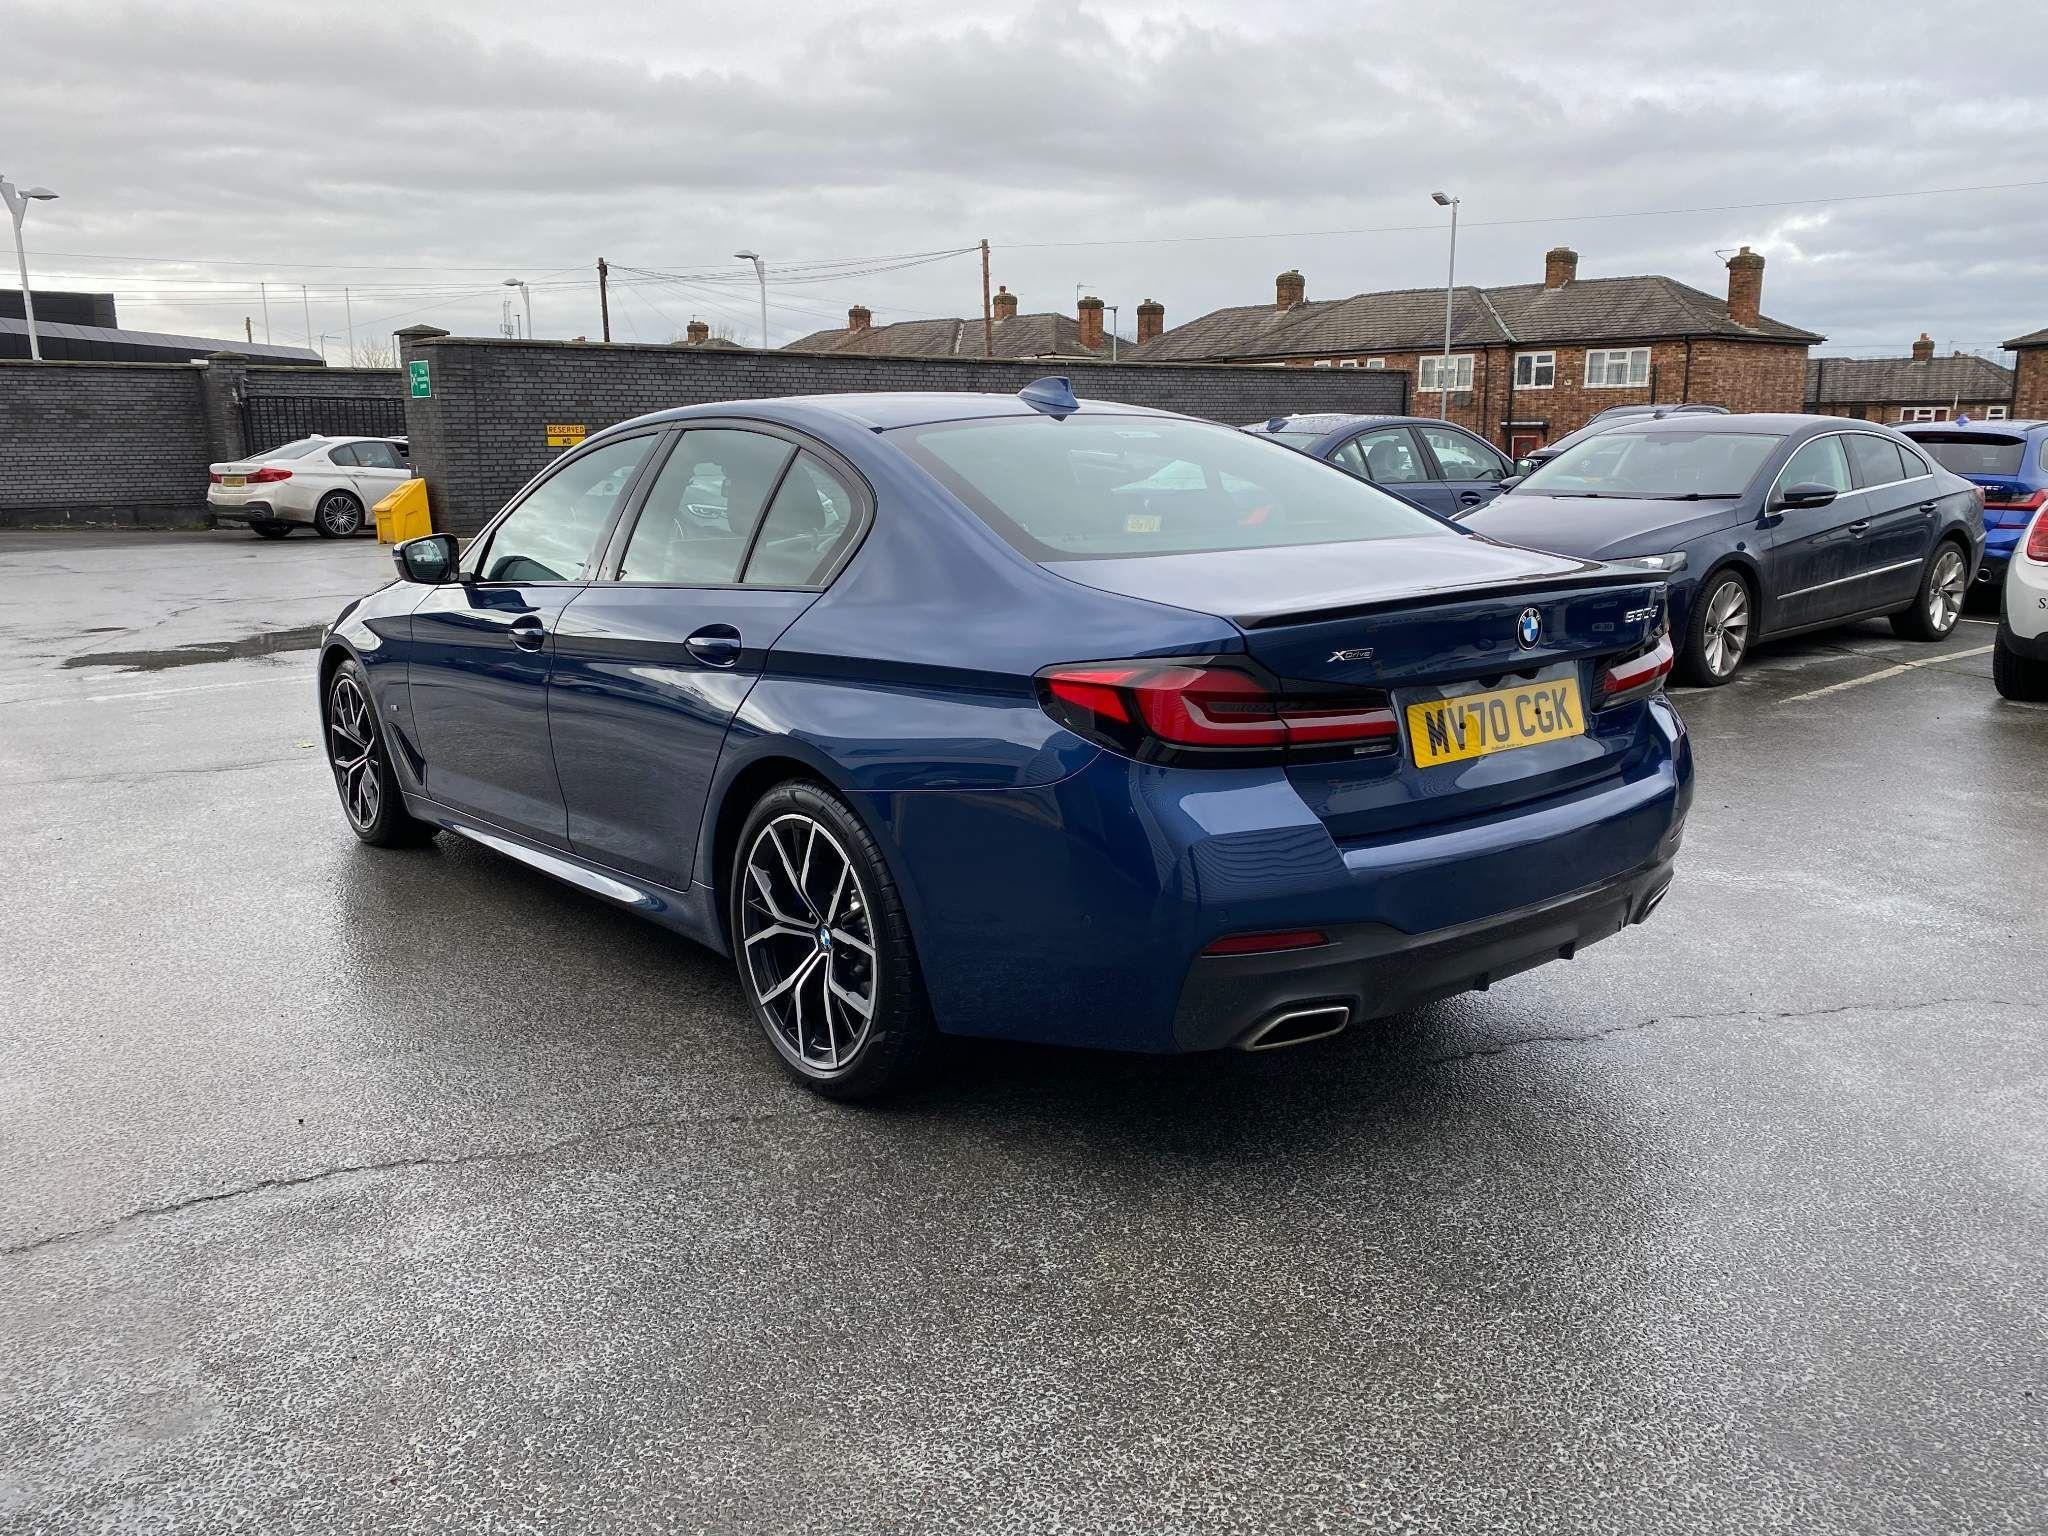 Image 2 - BMW 530d xDrive M Sport Saloon (MV70CGK)